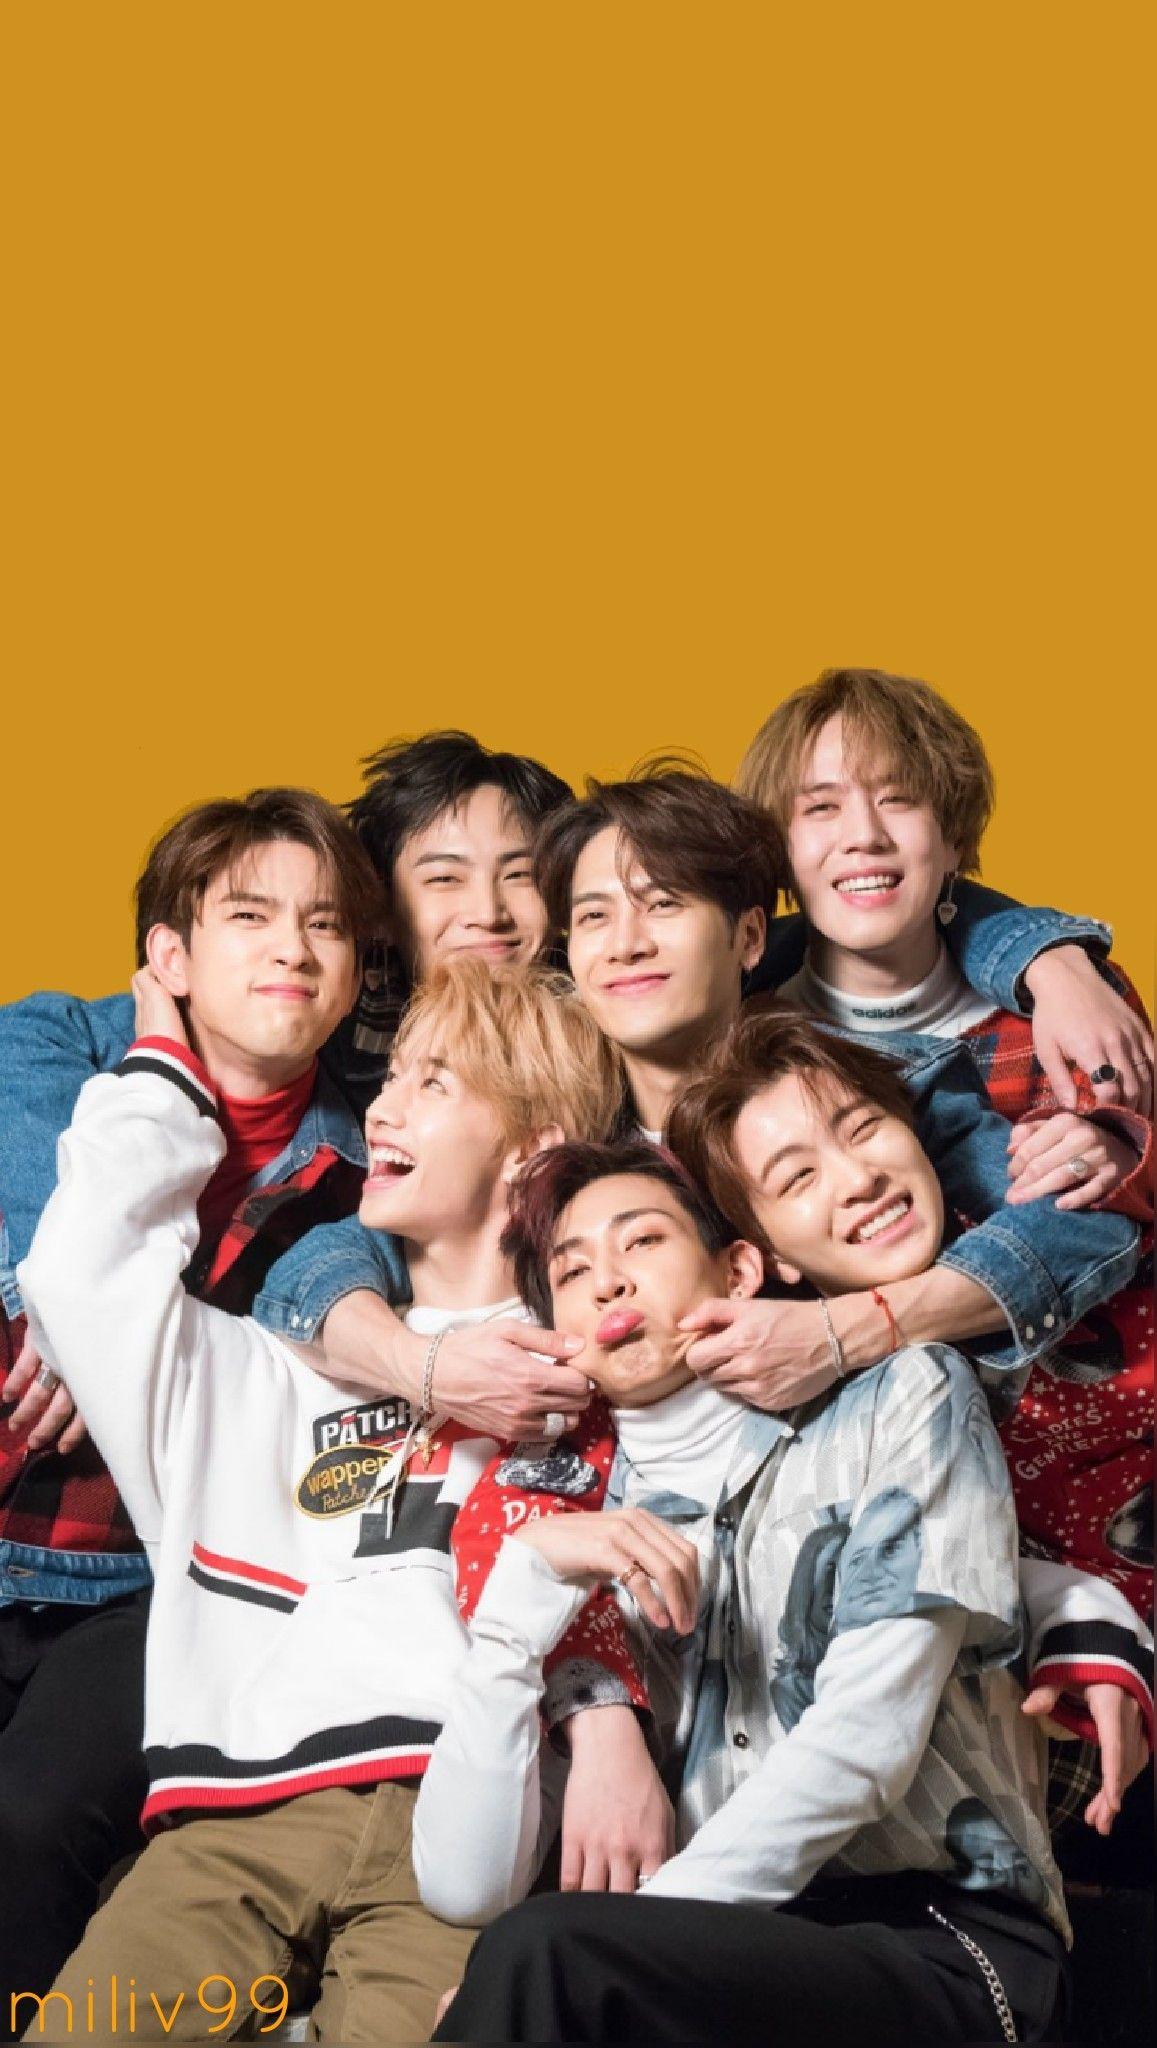 GOT7 Wallpaper♡ got7 kpop wallpaper got7 wallpaper